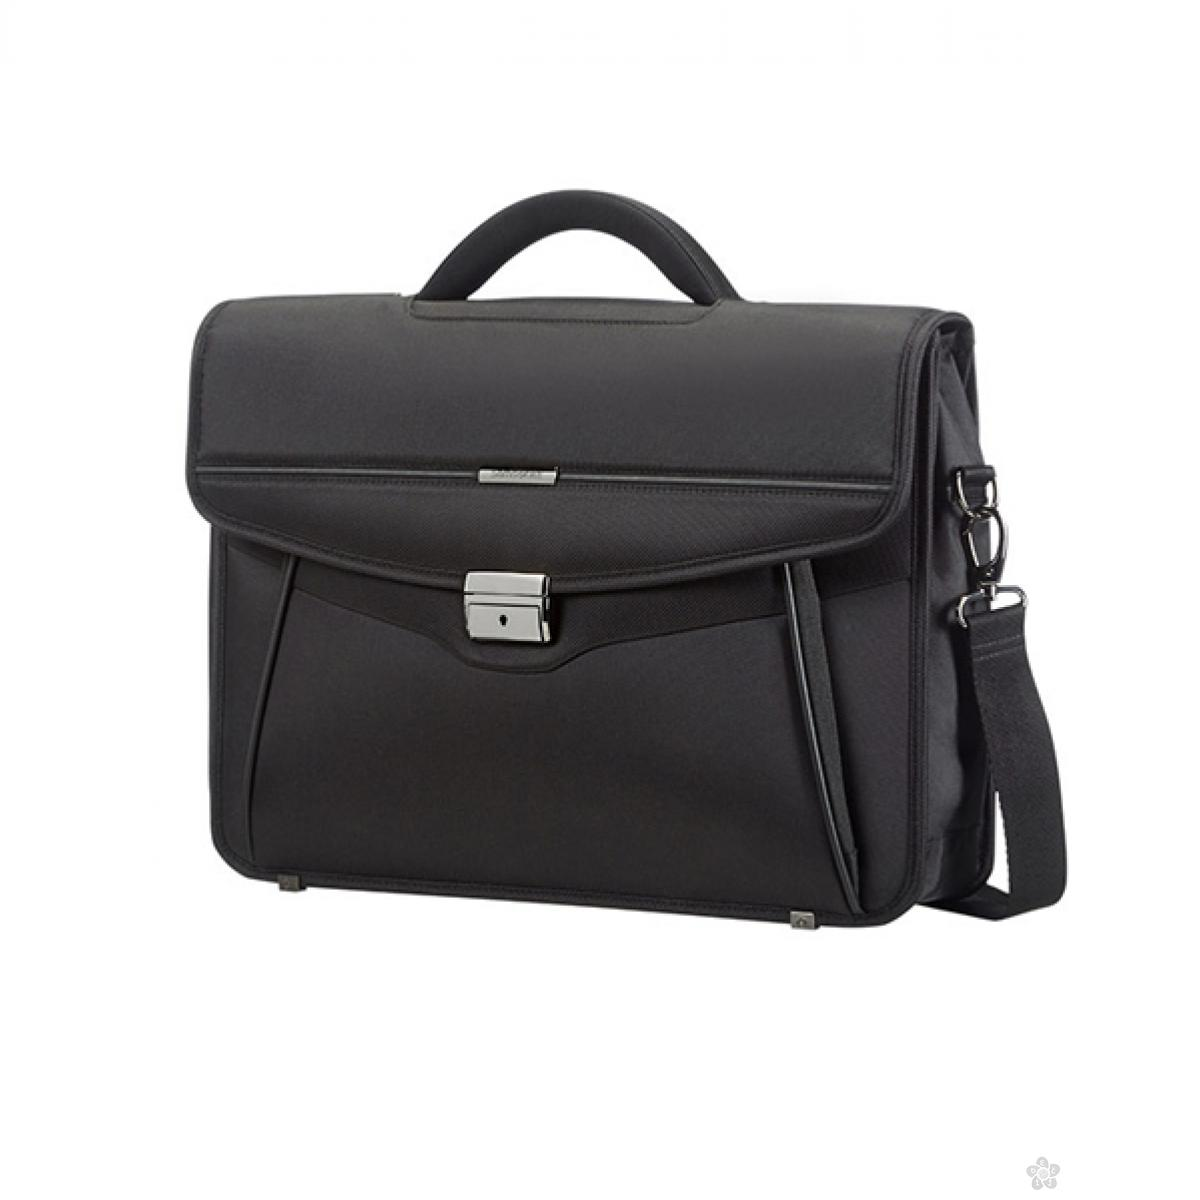 Samsonite poslovna torba BRIEFCASE 1 GUSSET 15.6